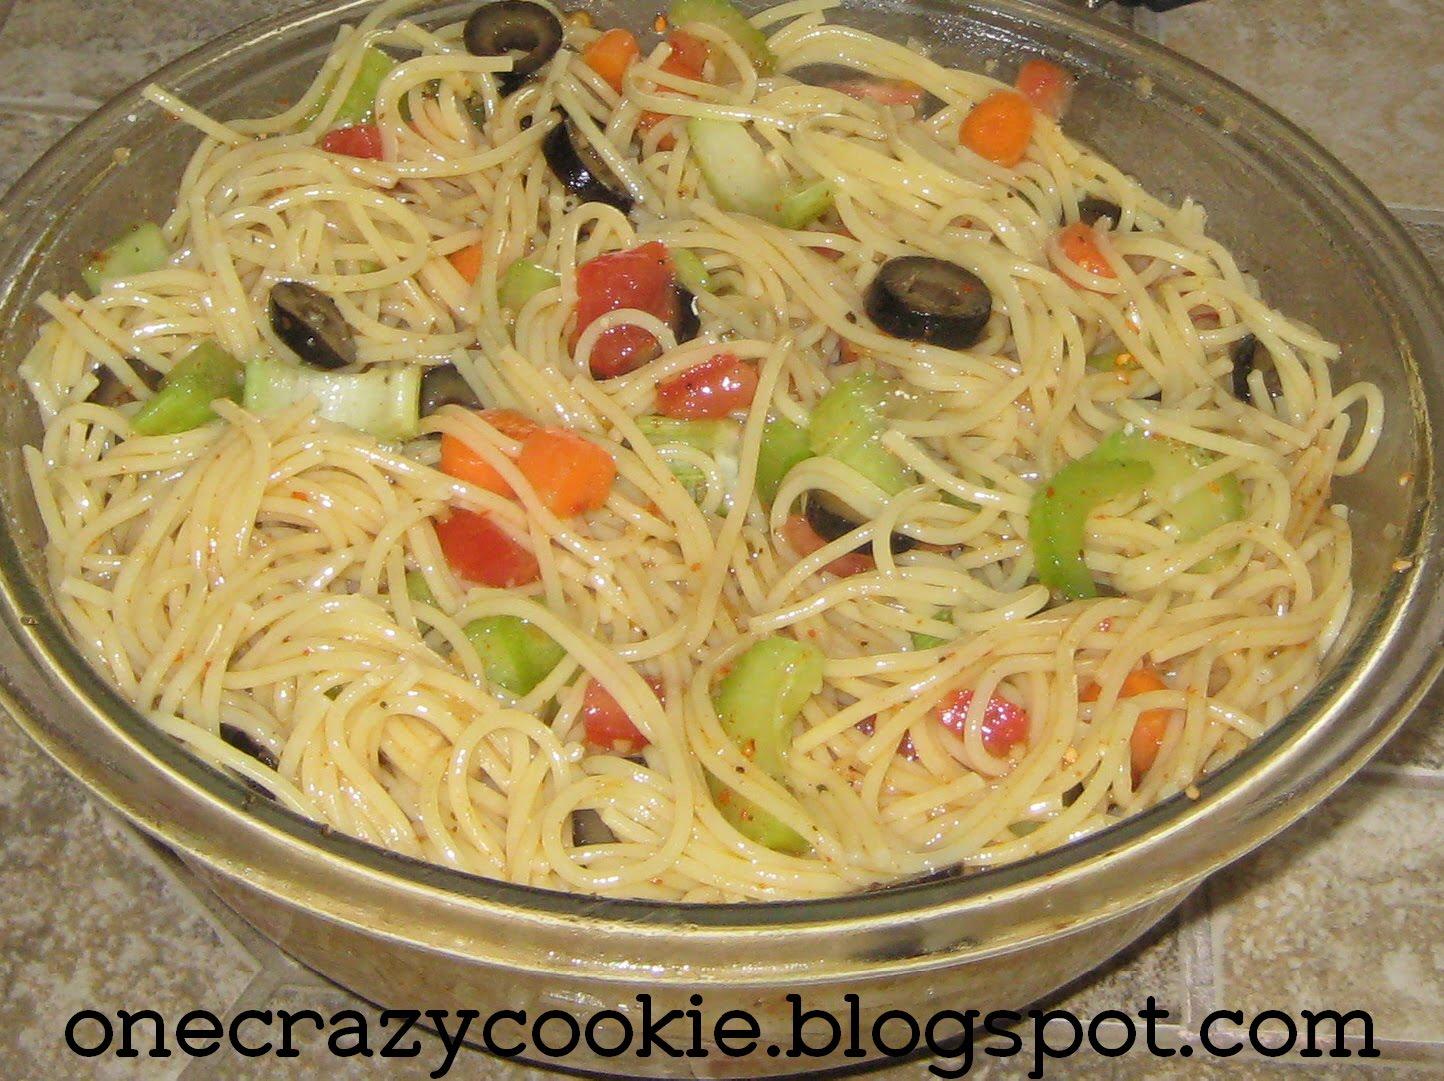 One crazy cookie spaghetti salad